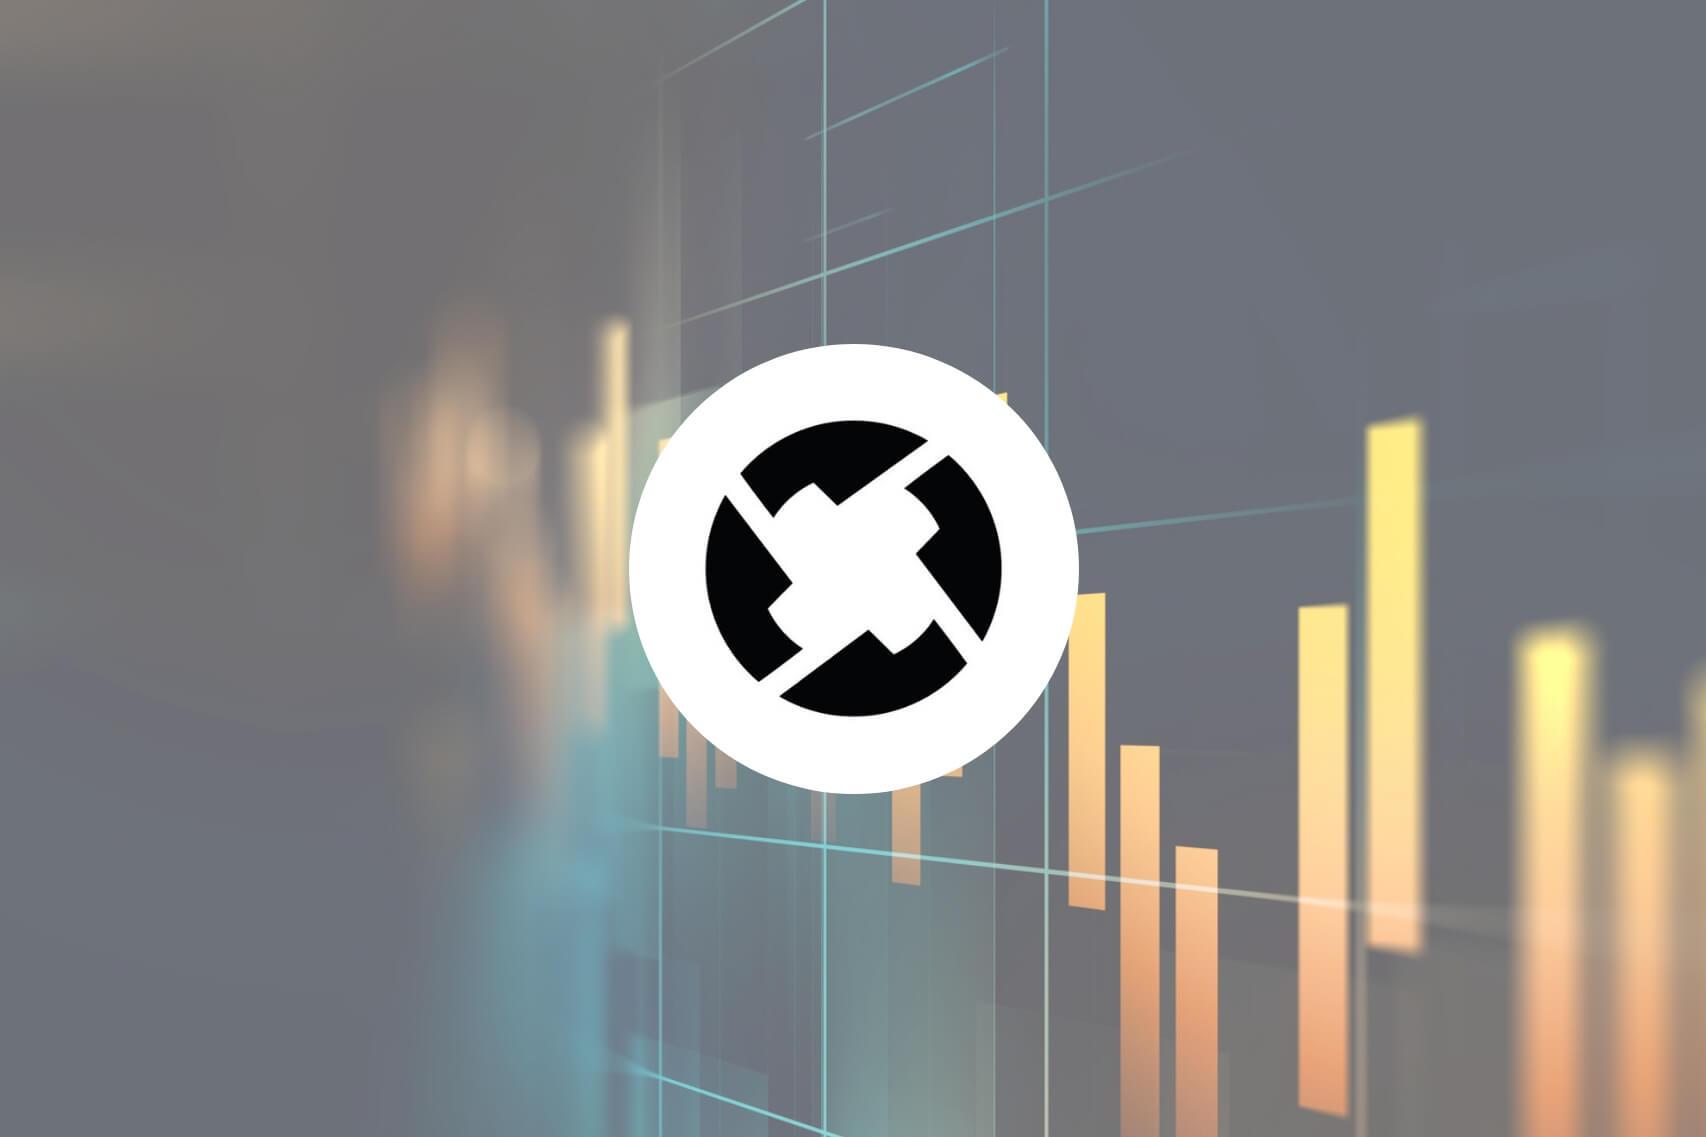 Price Analysis: ZRX